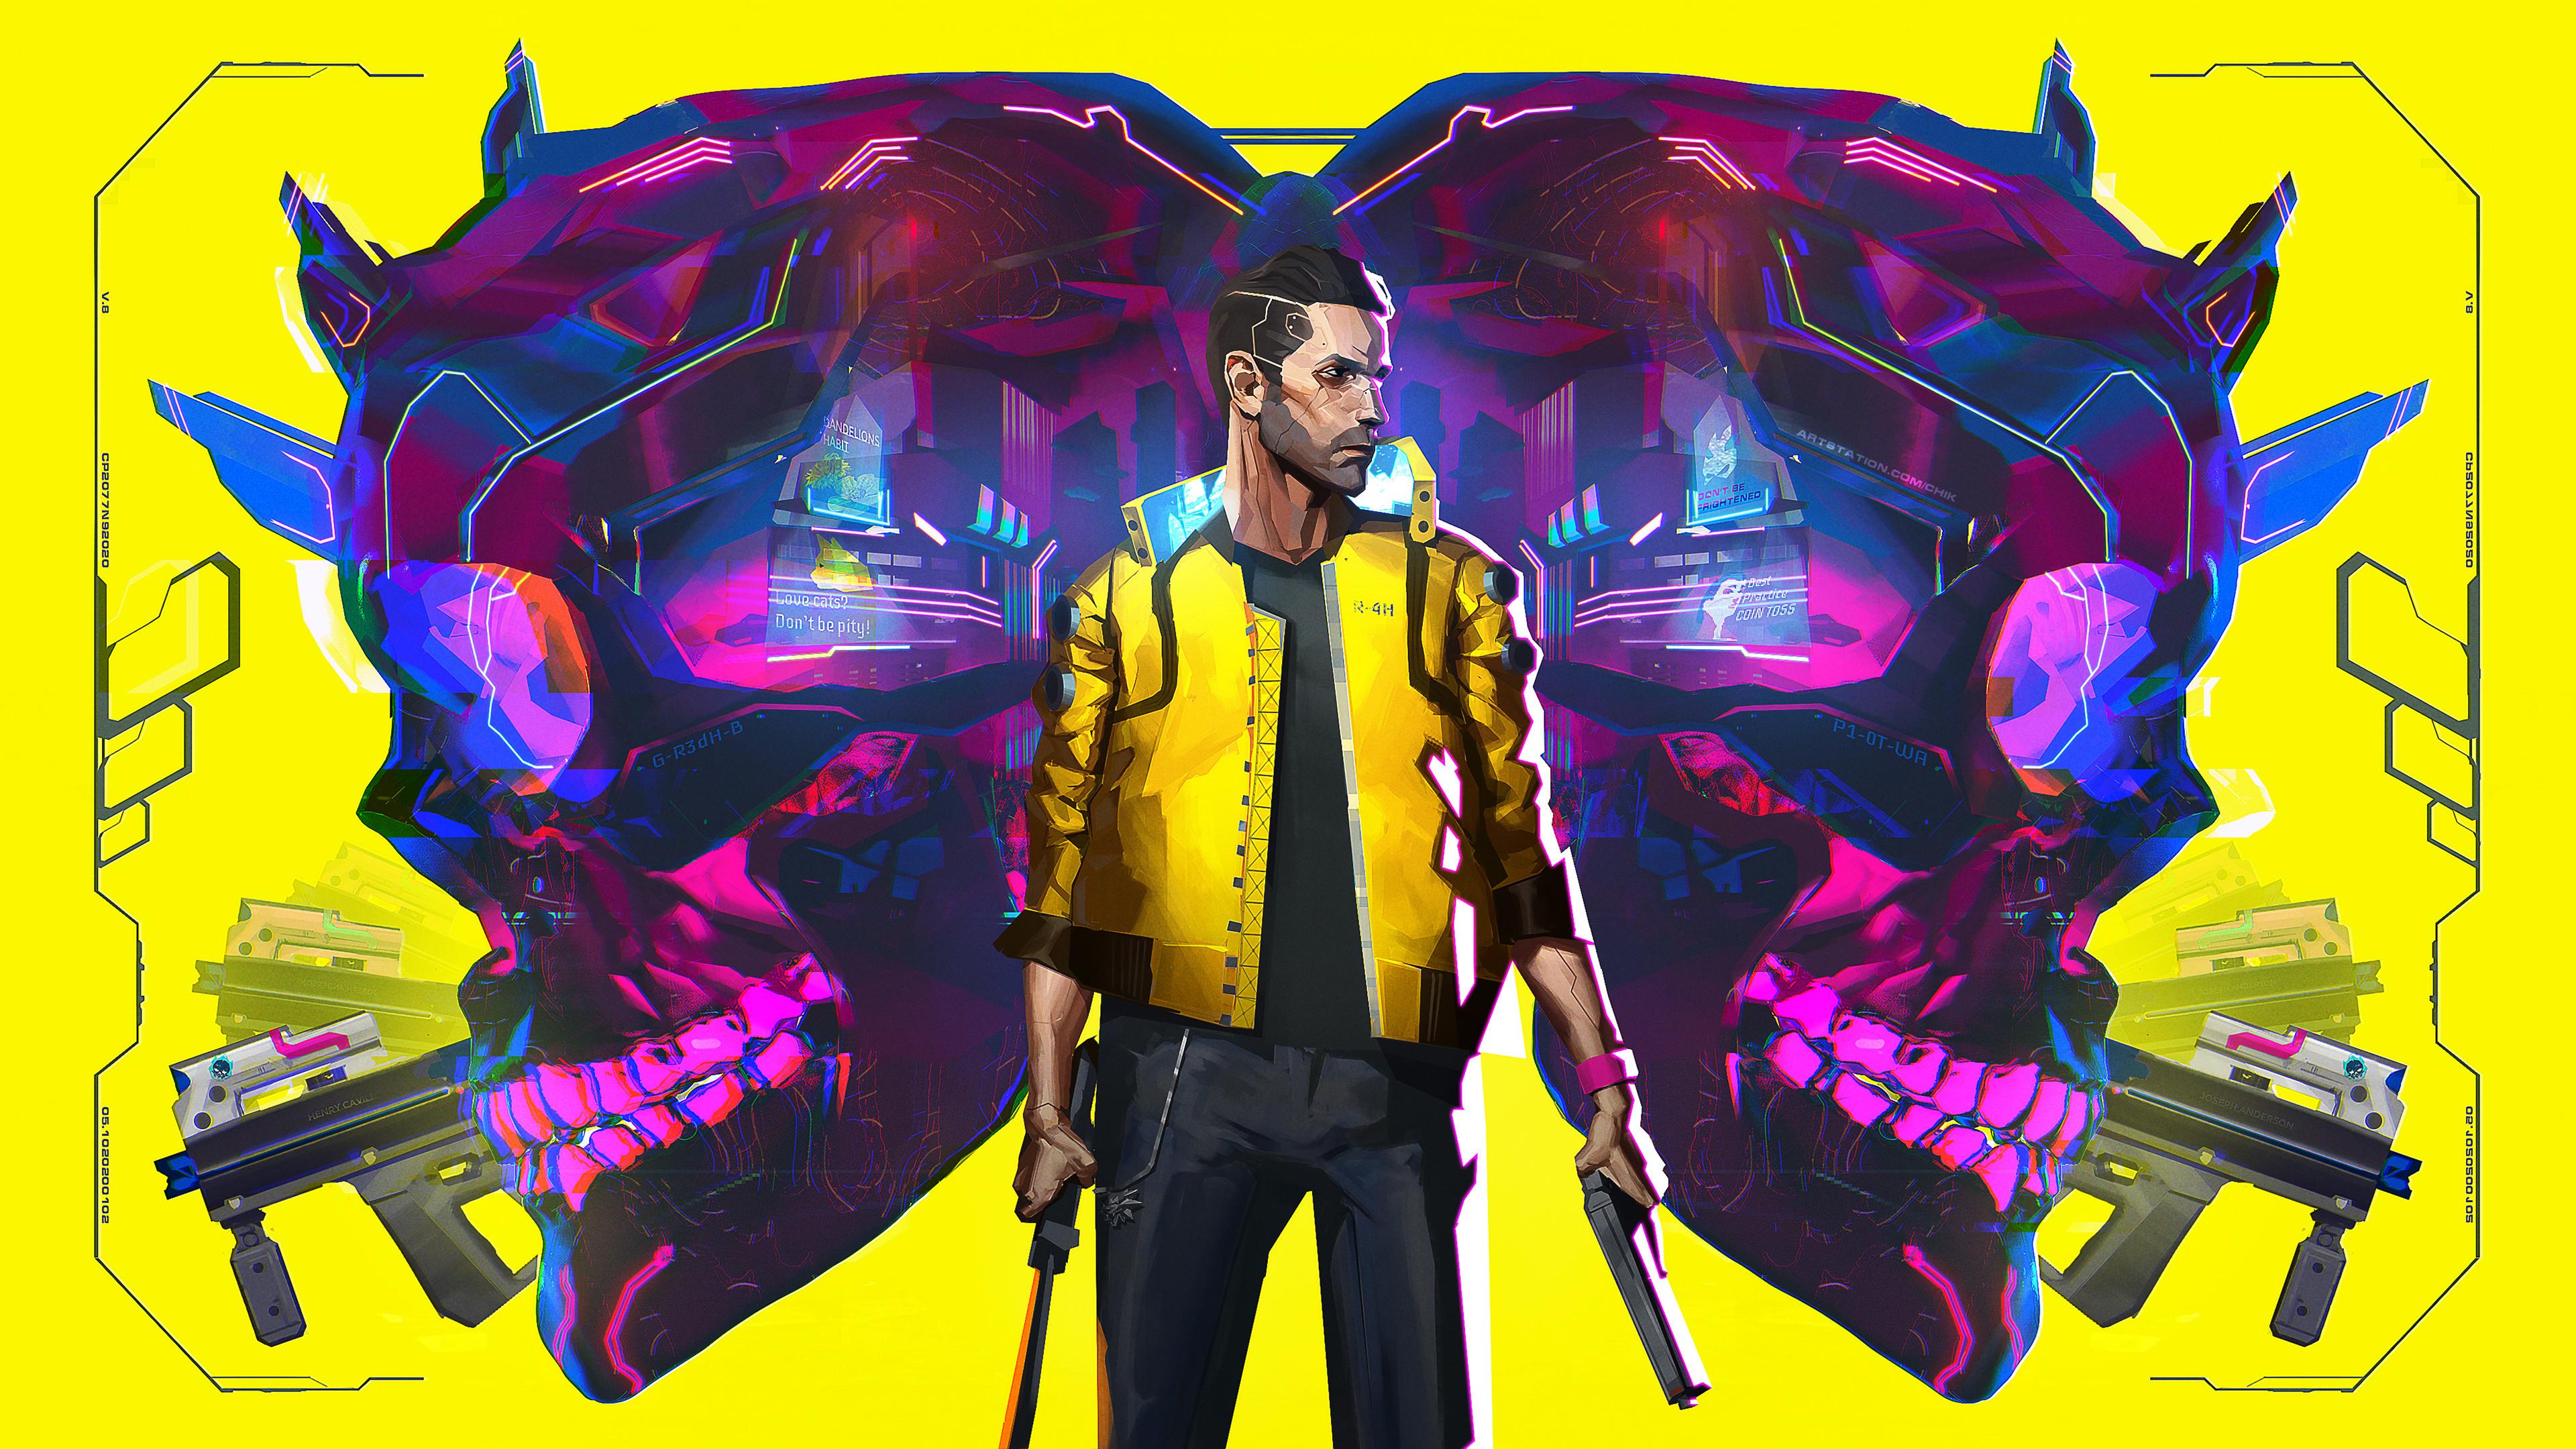 Cyberpunk 2077 Illustration 2020 Wallpaper, HD Games 4K ...